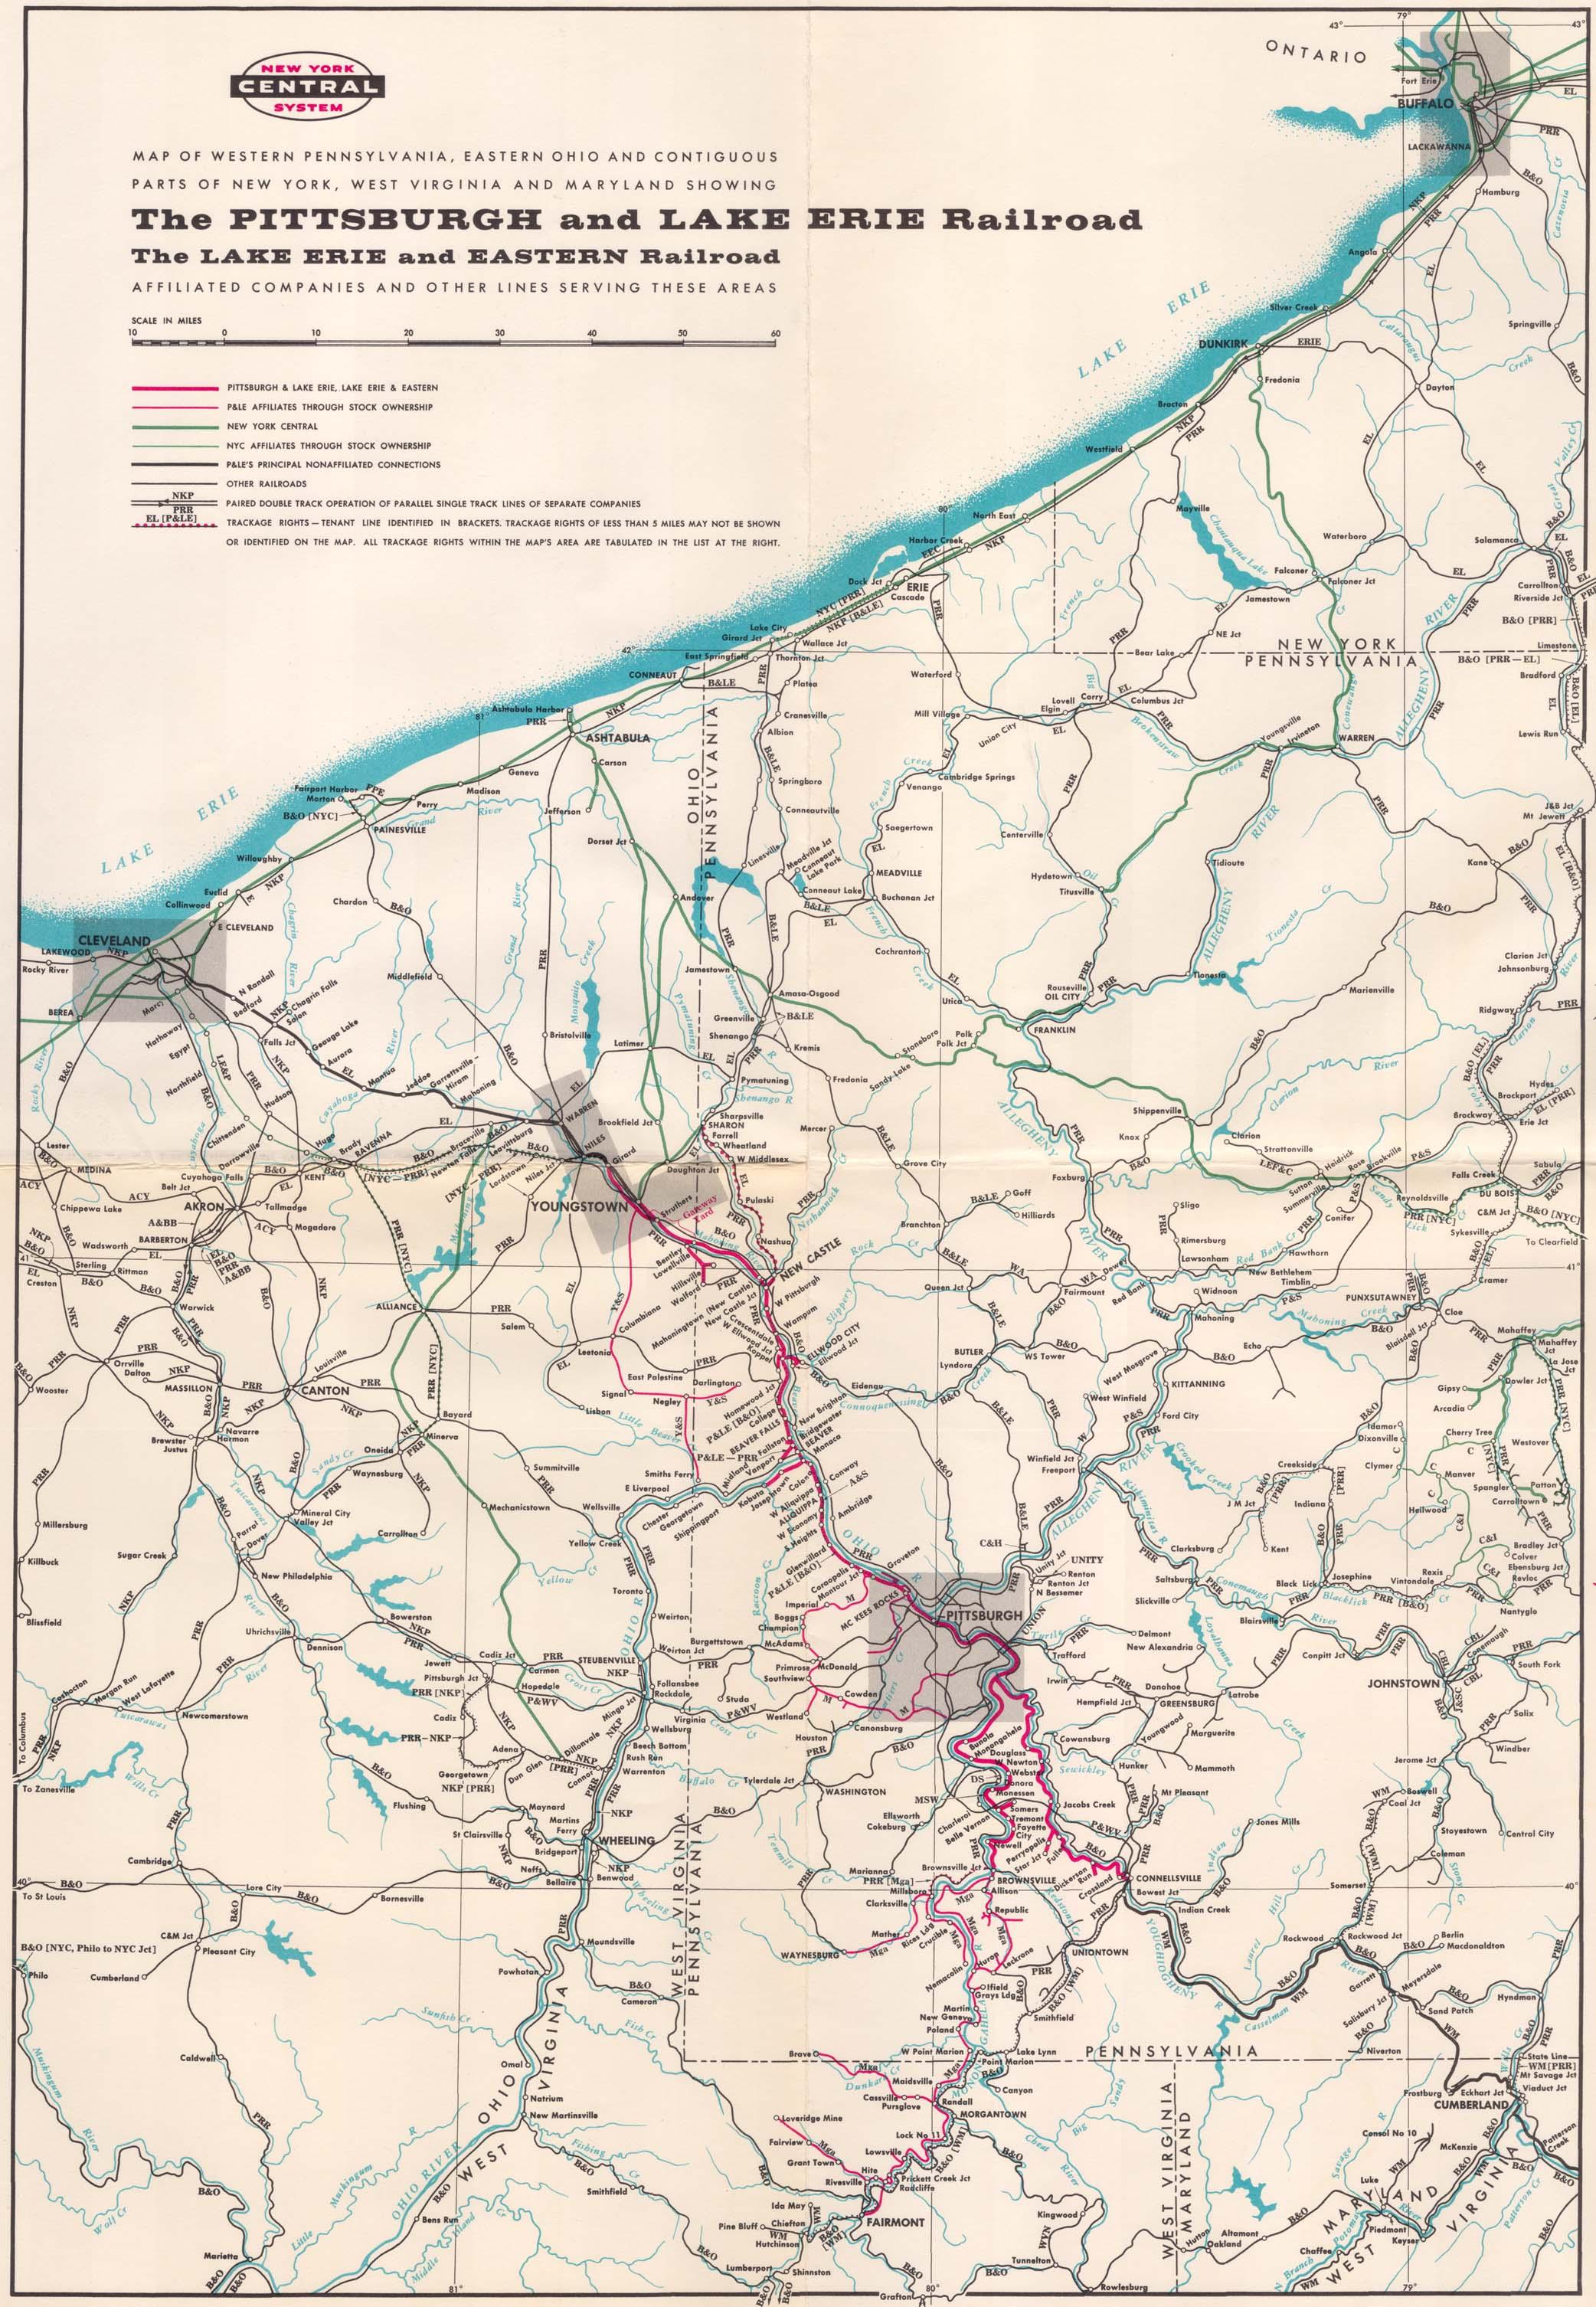 Transportation Company - Pittsburgh & Lake Erie - Railroad